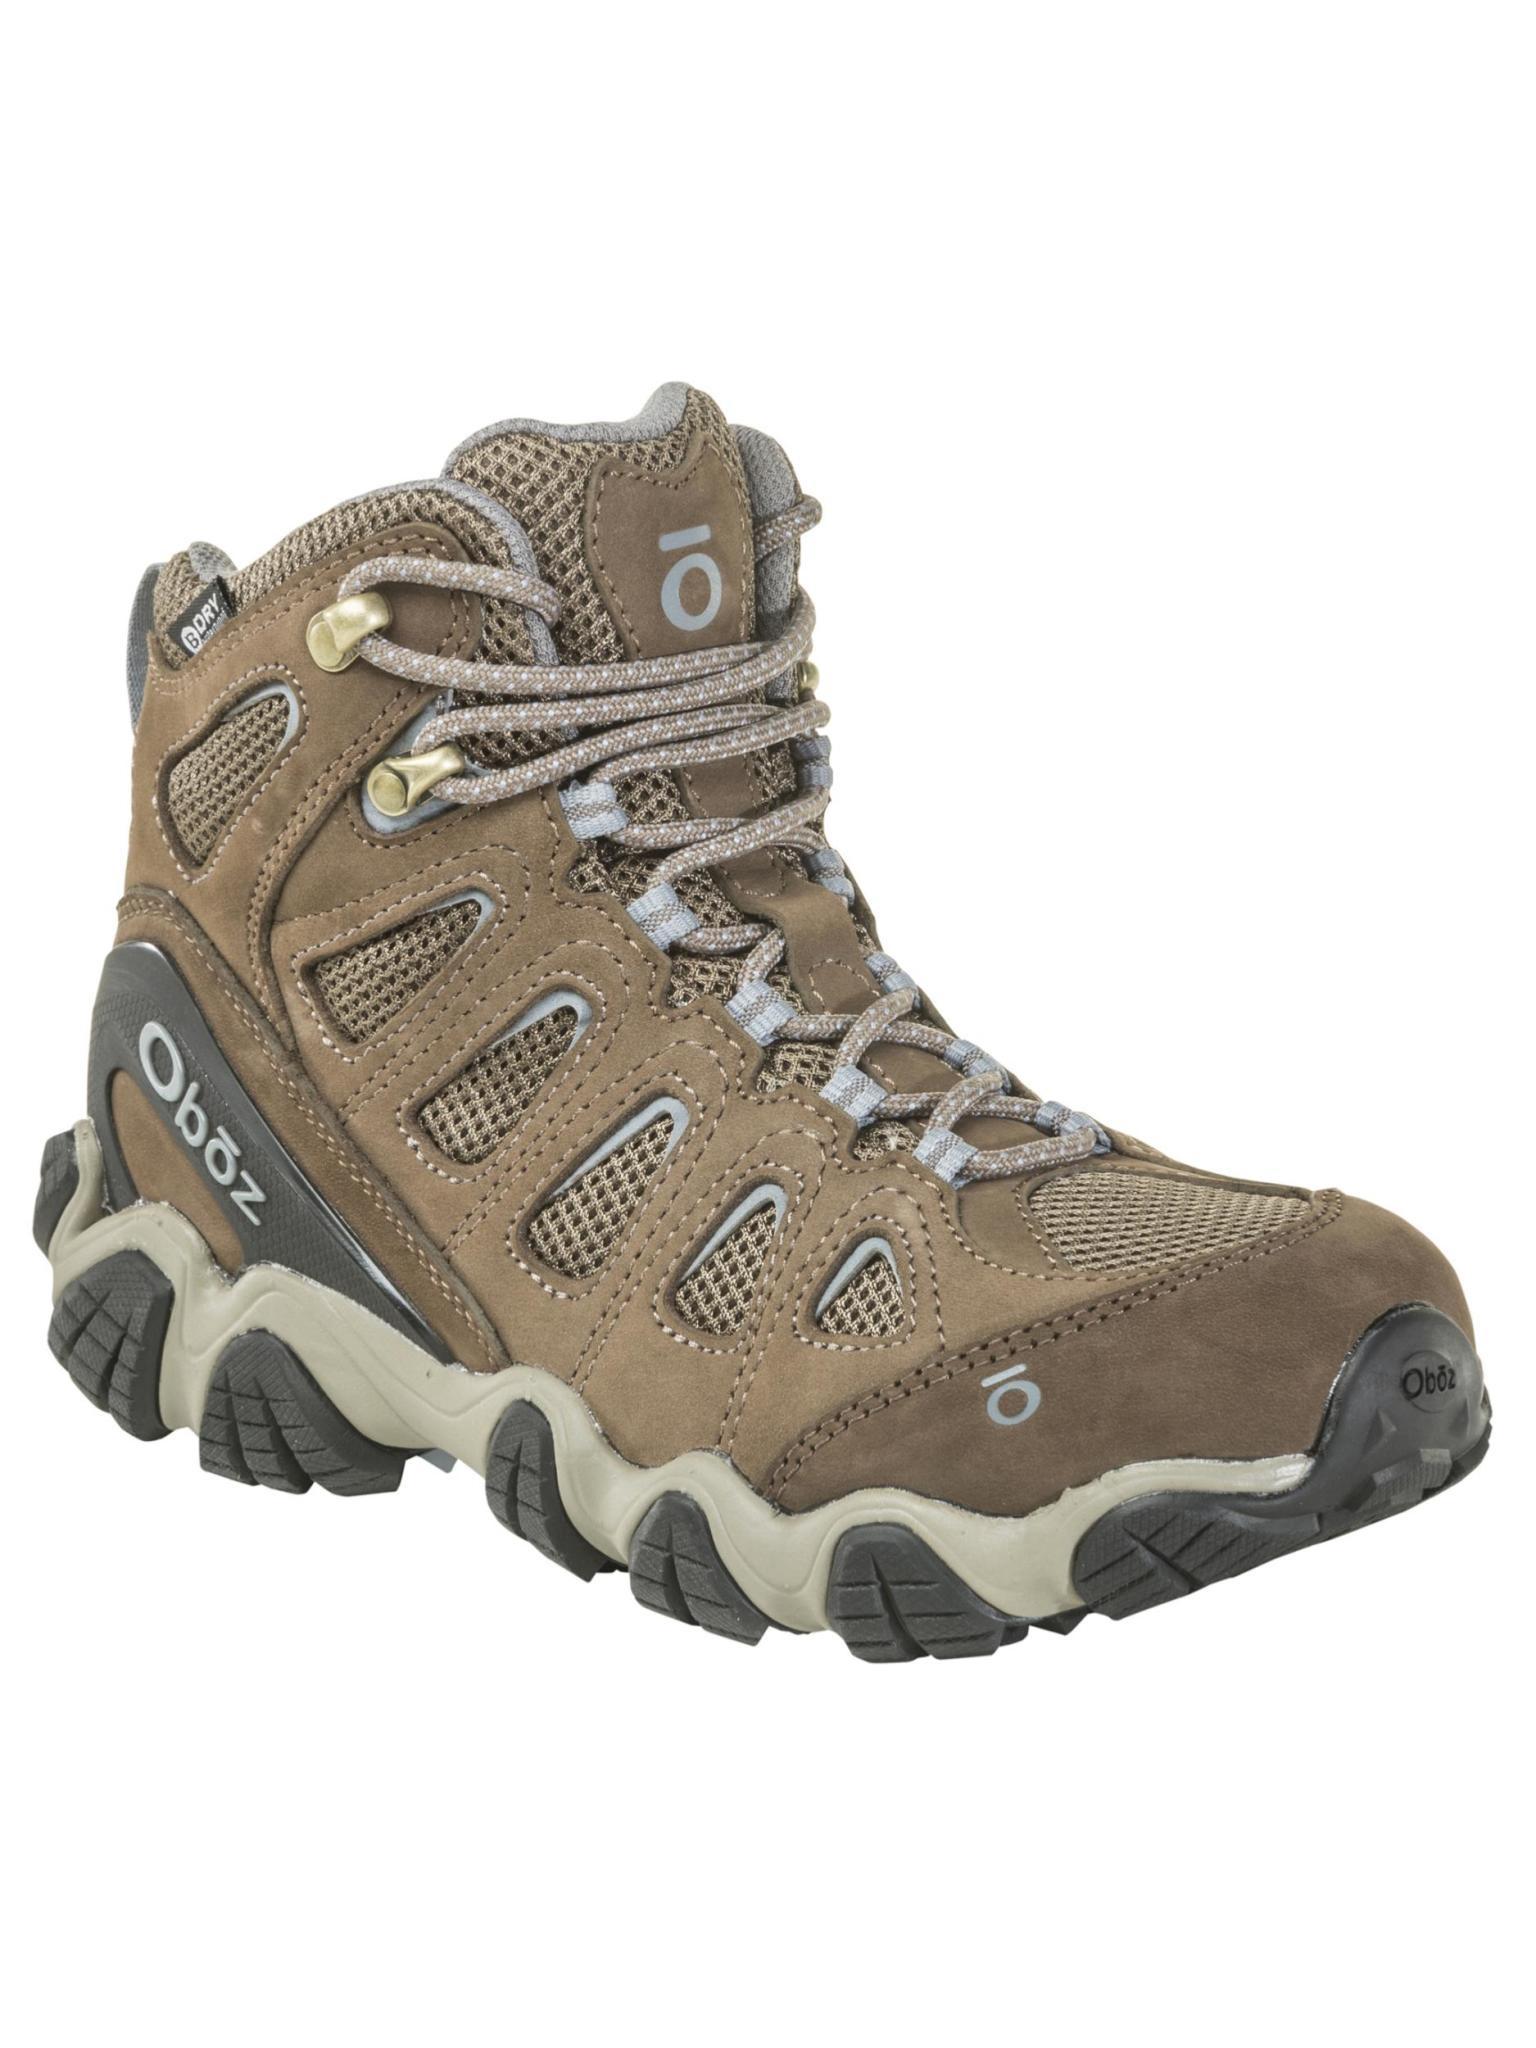 Oboz Women's Sawtooth II Mid B-Dry Hiker